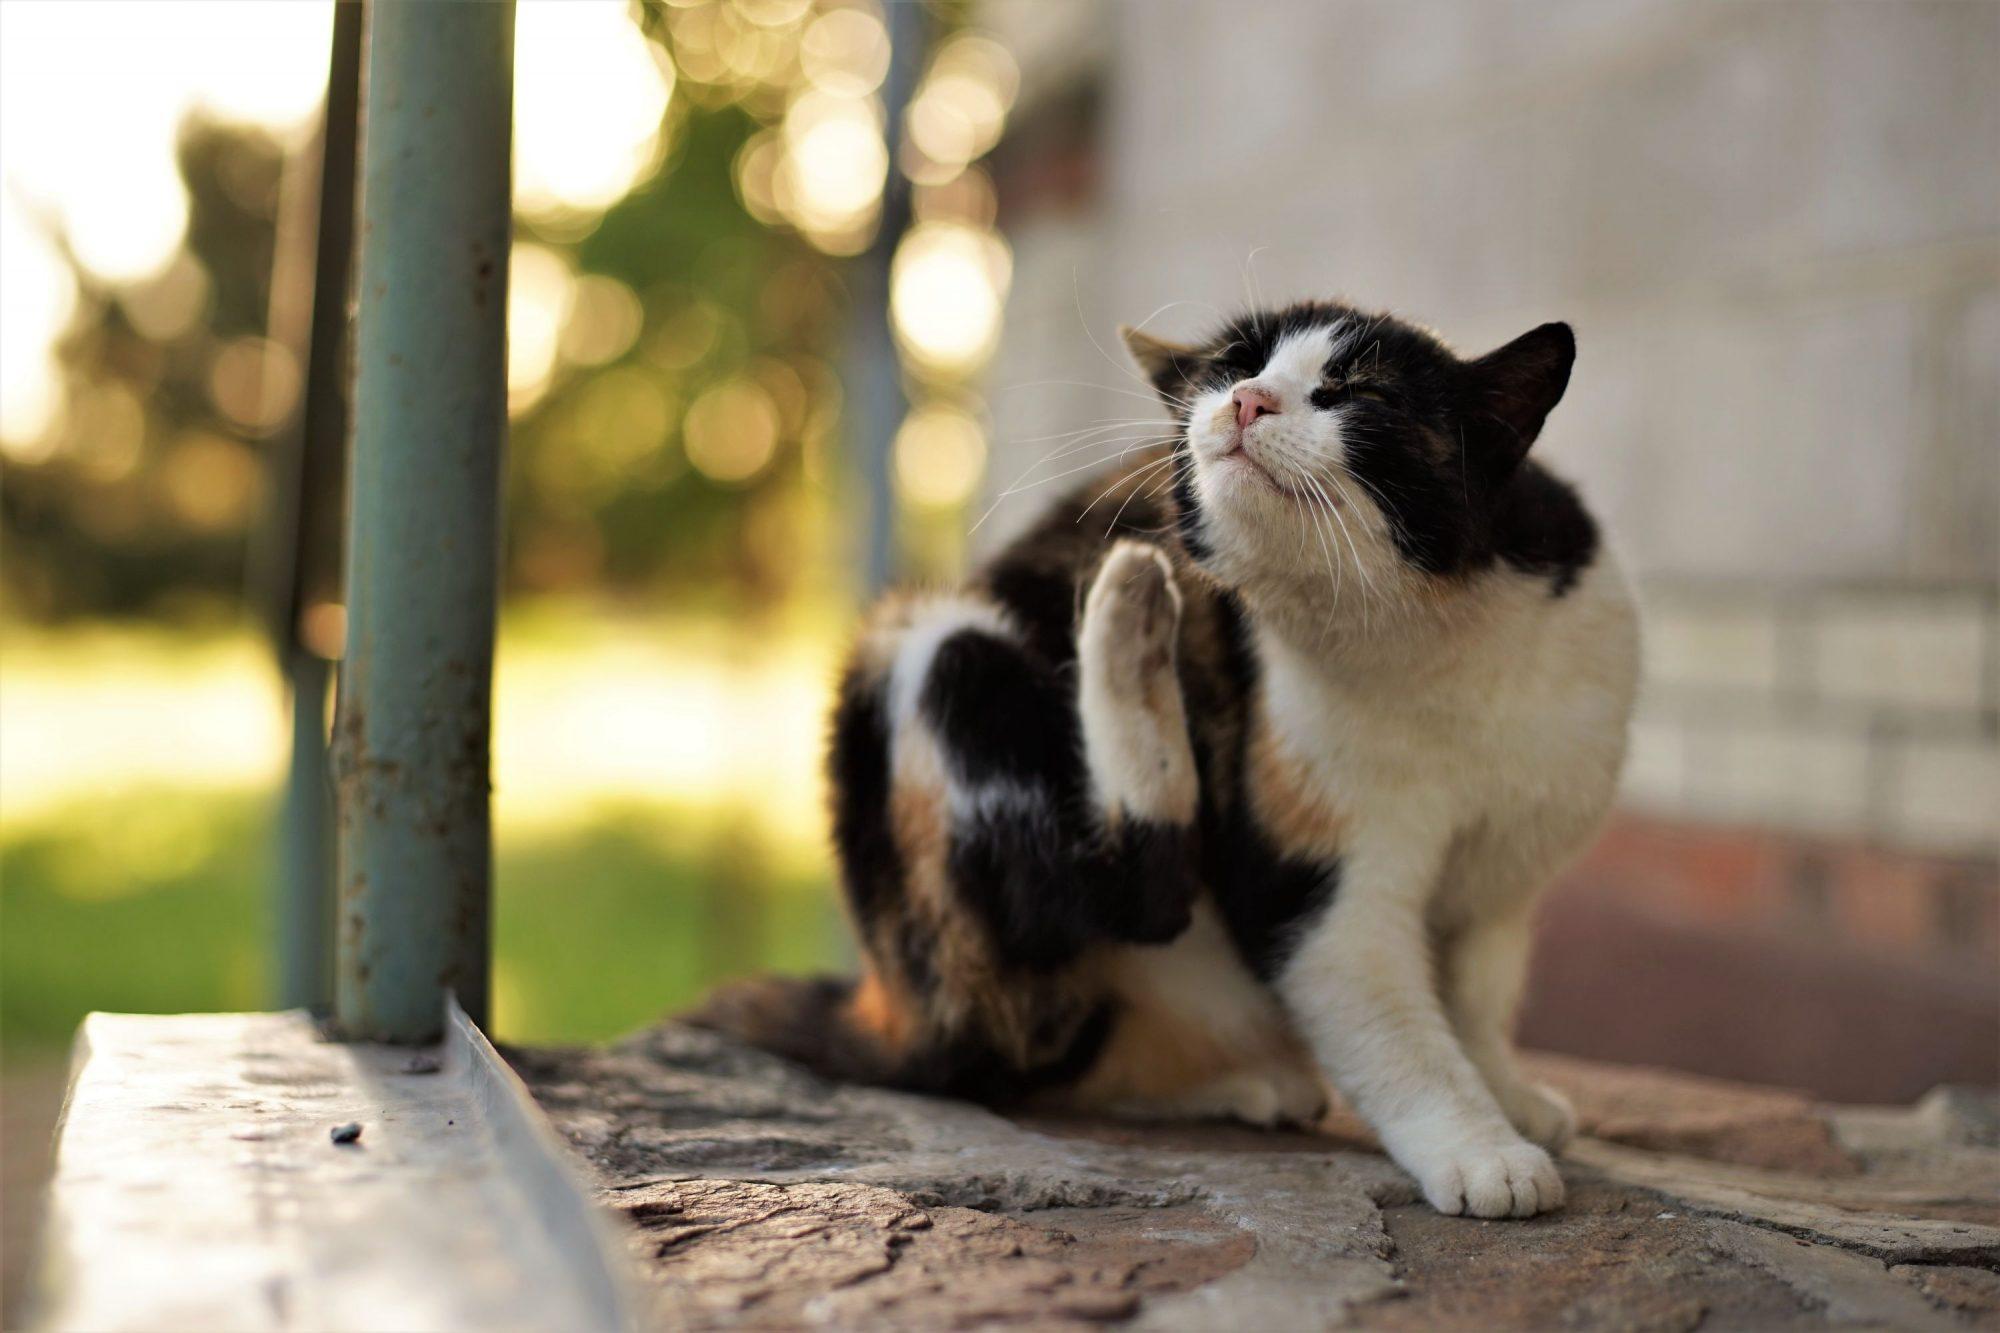 pet cat itching itself outside.